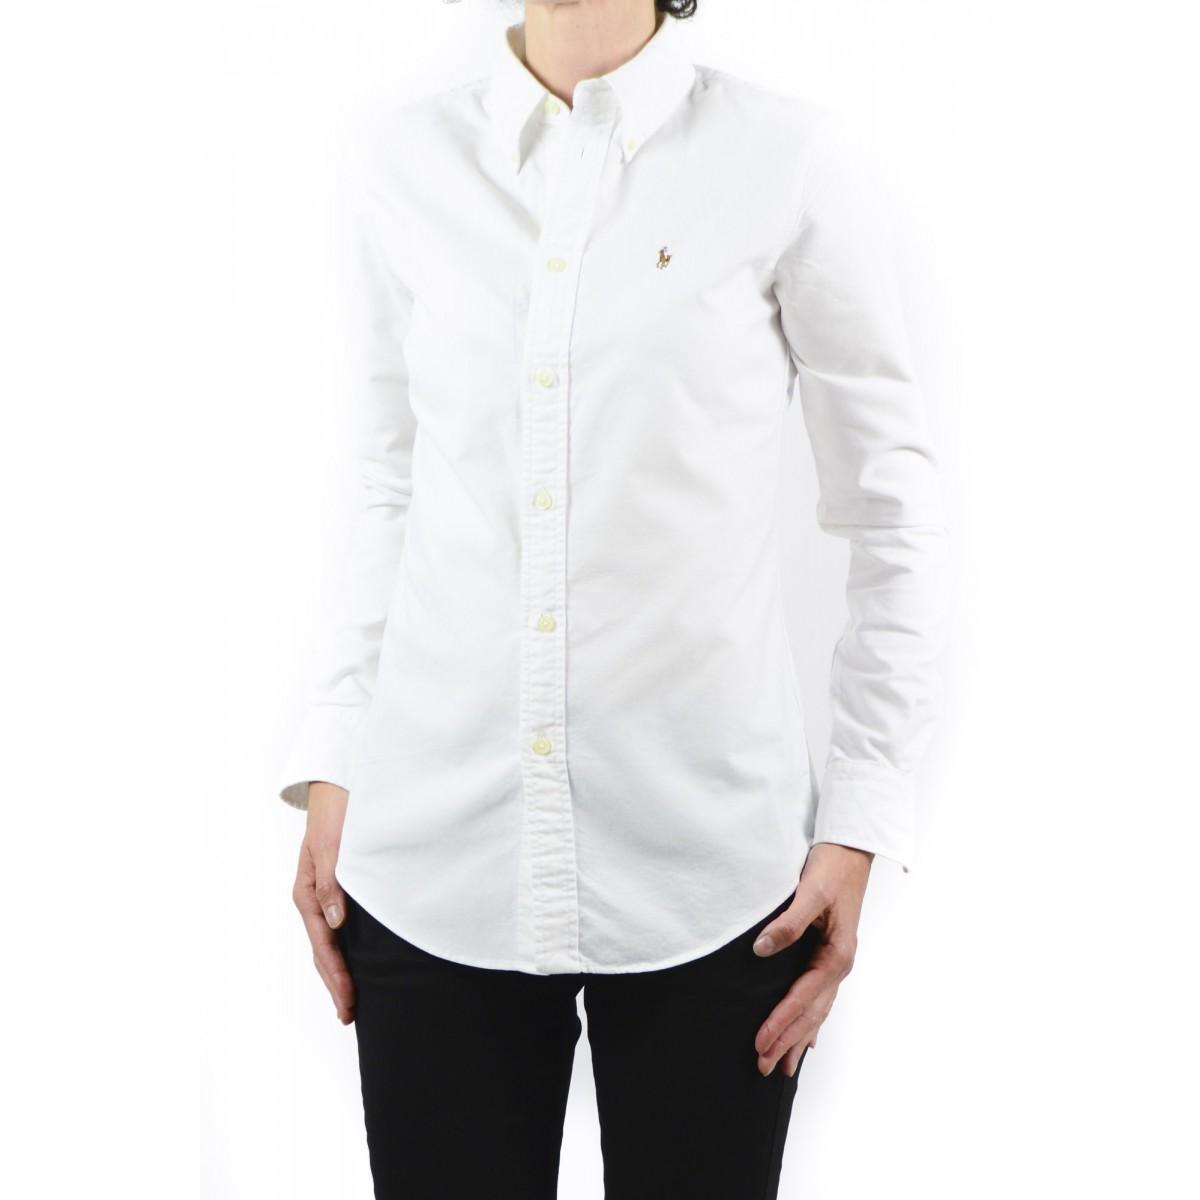 Bluse Ralph Lauren Frauen - V33Iohrsc9203 B11D1 - bianco